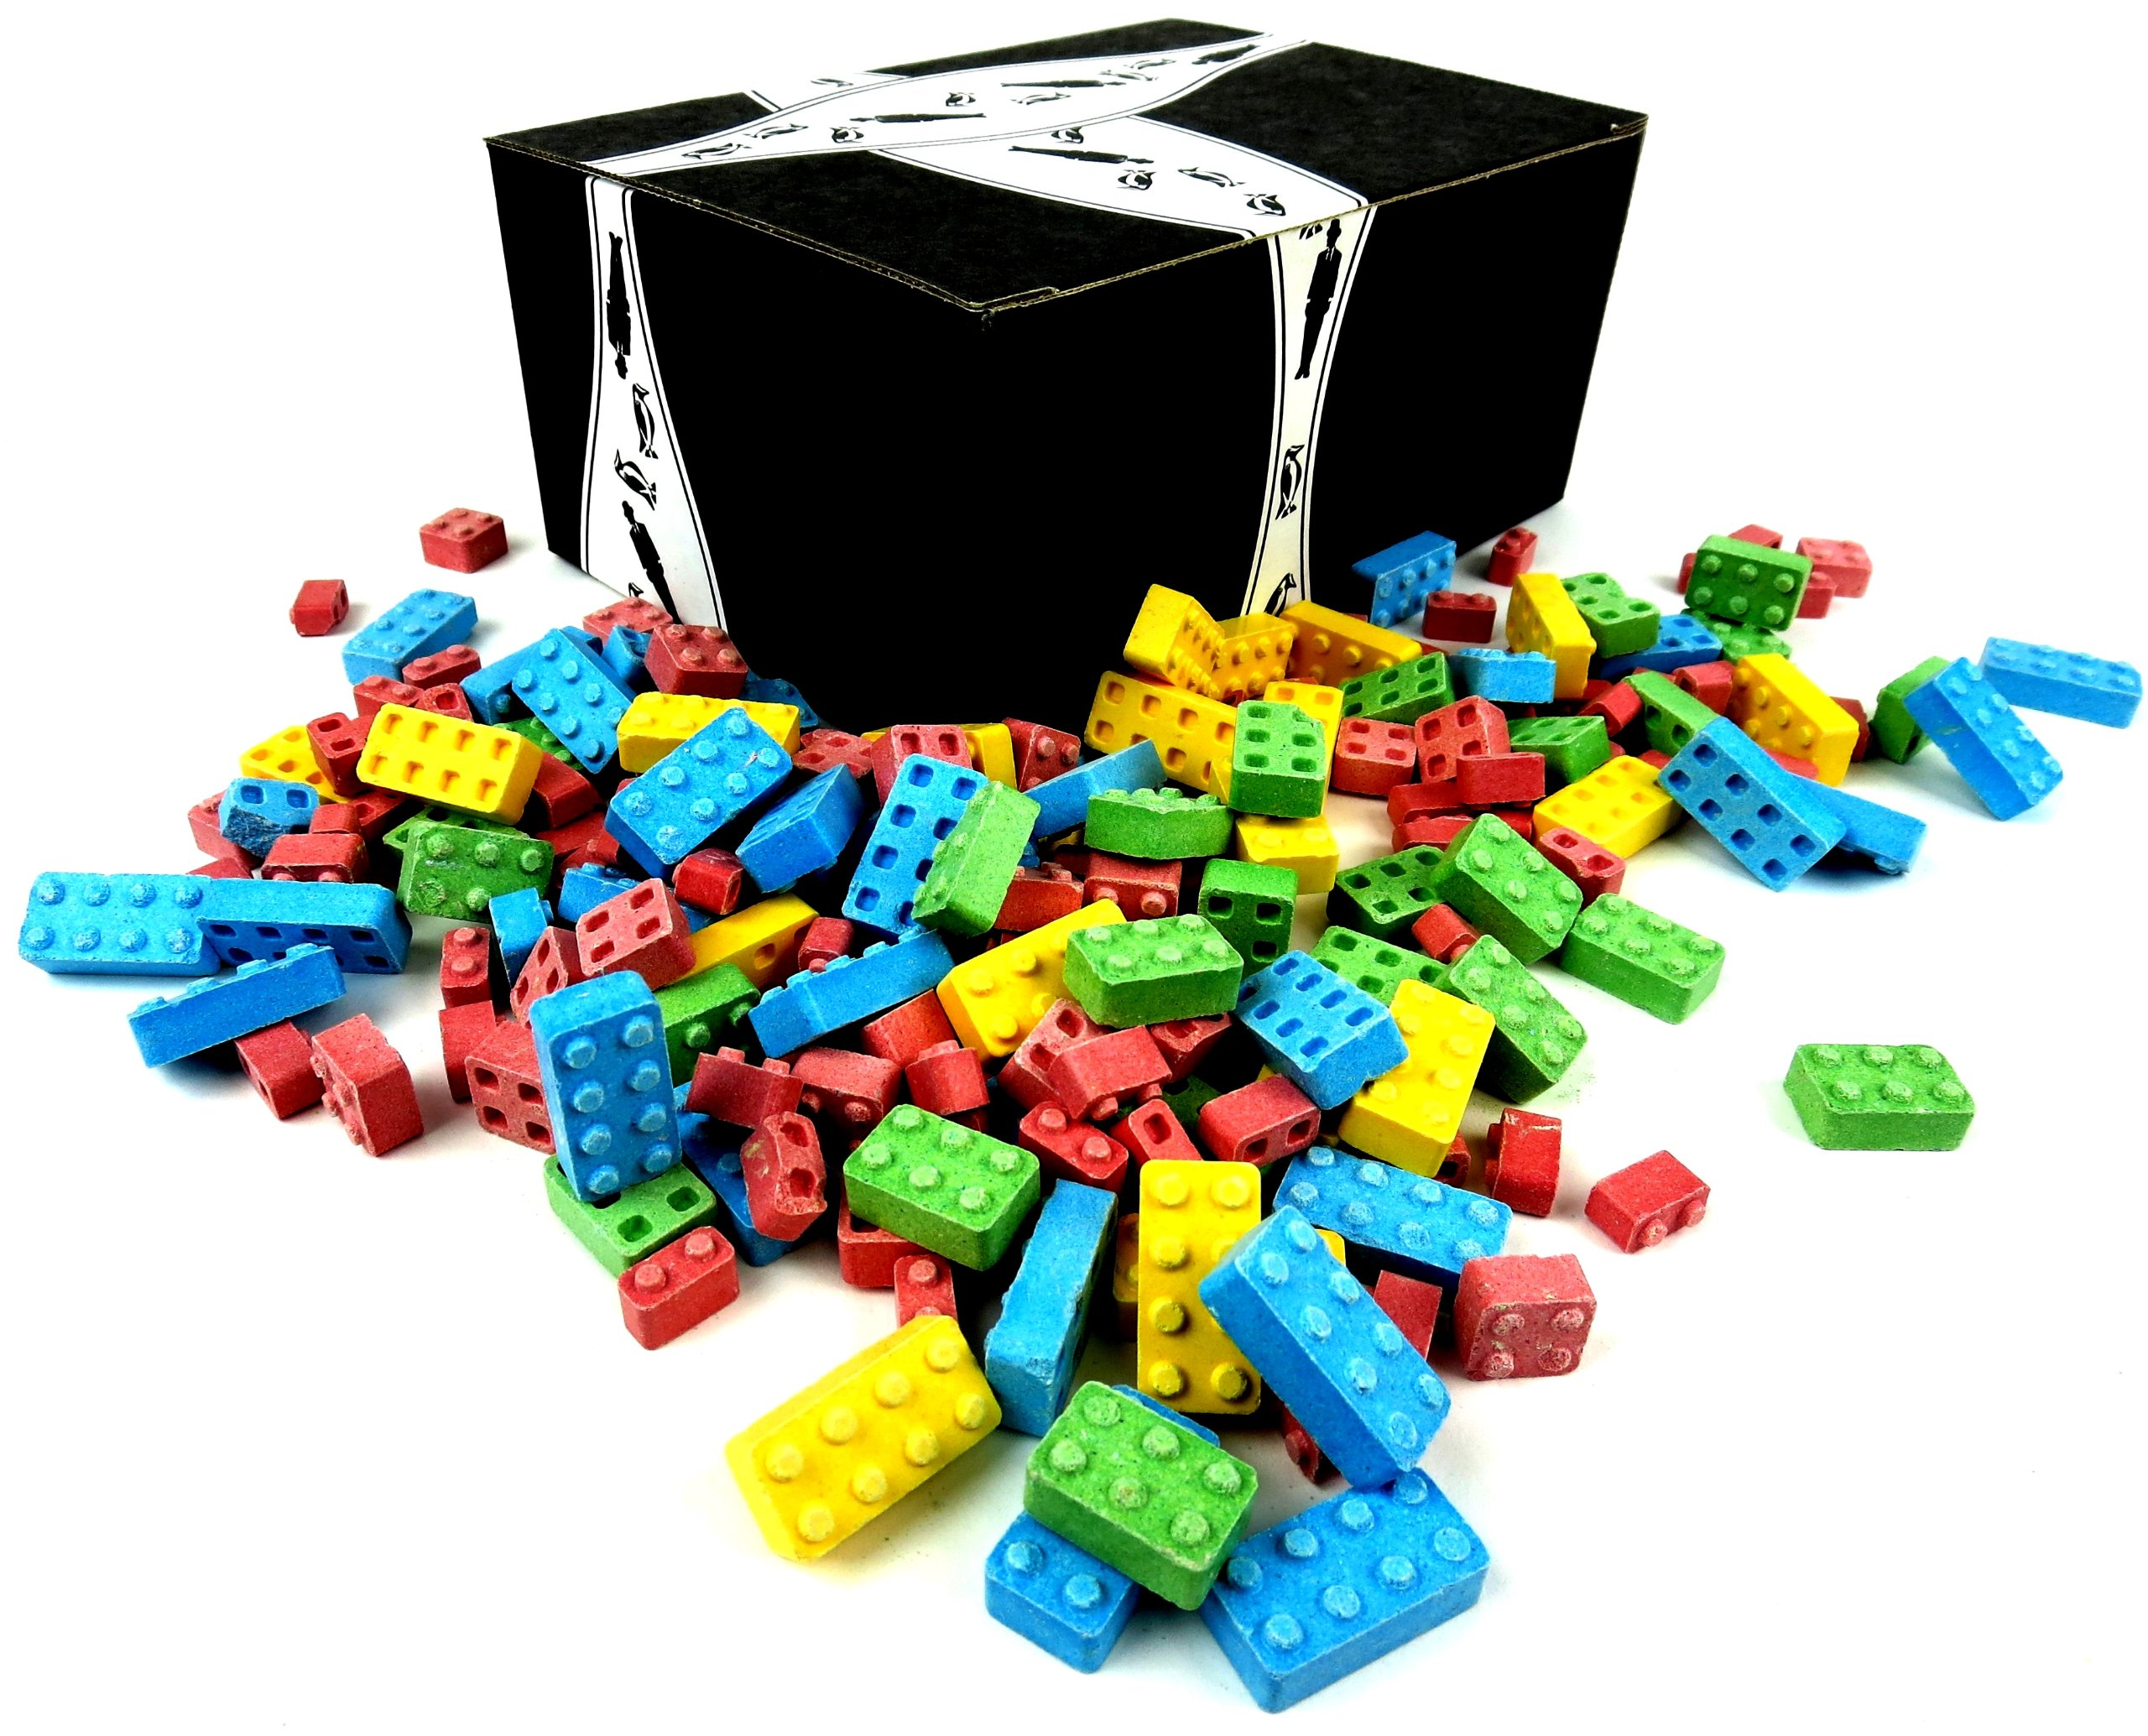 Cuckoo Luckoo Candy Blocks, 2 lb Bag in a BlackTie Box